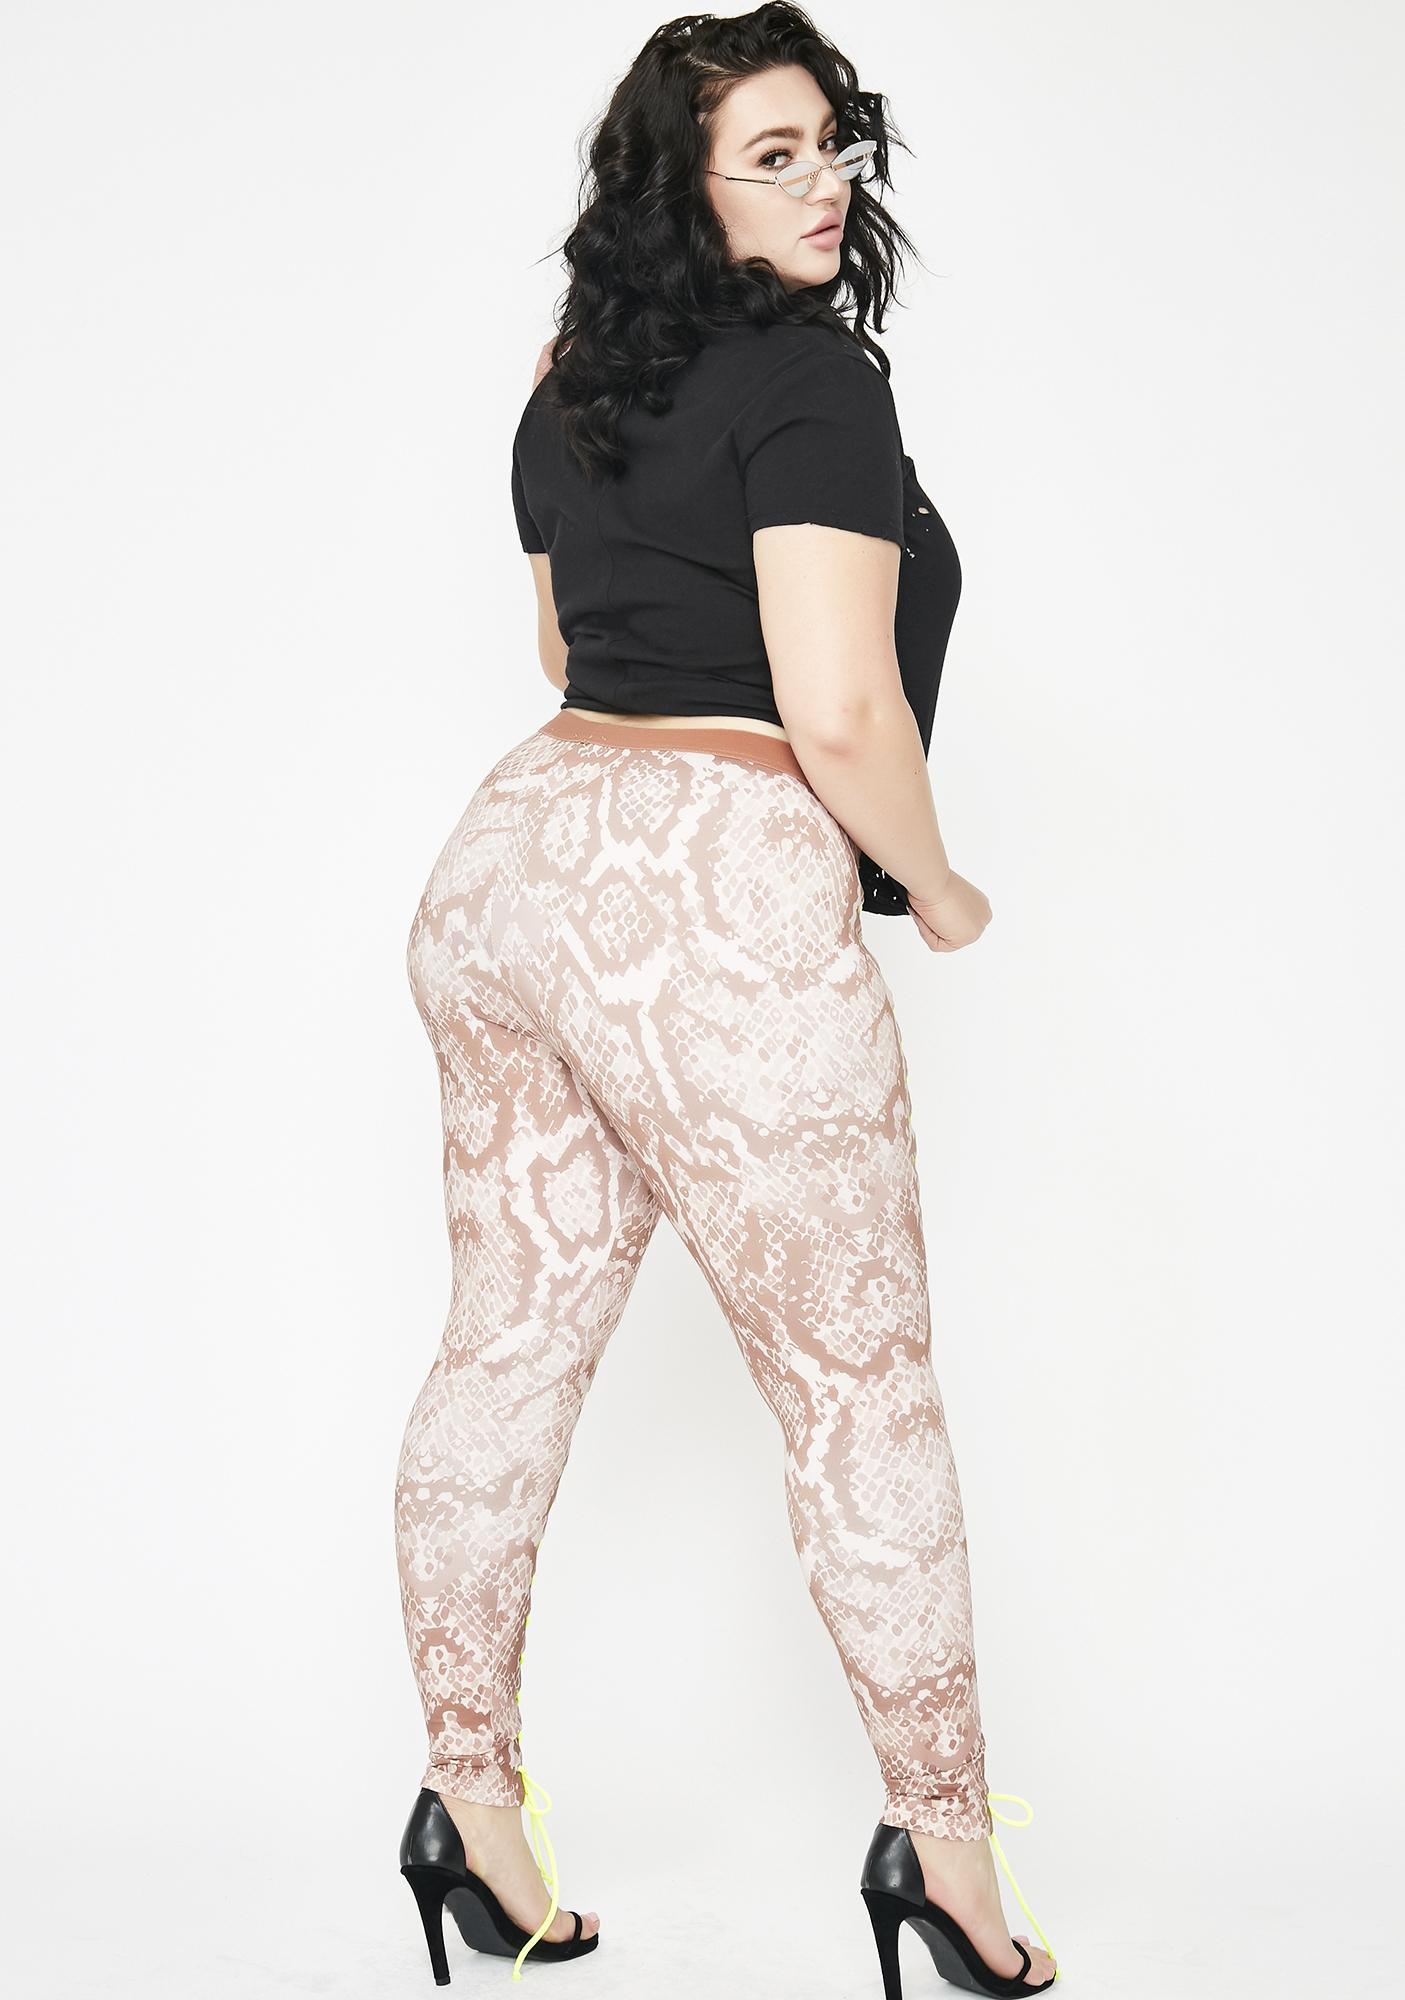 4517925c16 Plus Size Poster Grl Mad Ish Talker Nancy Corset Leggings